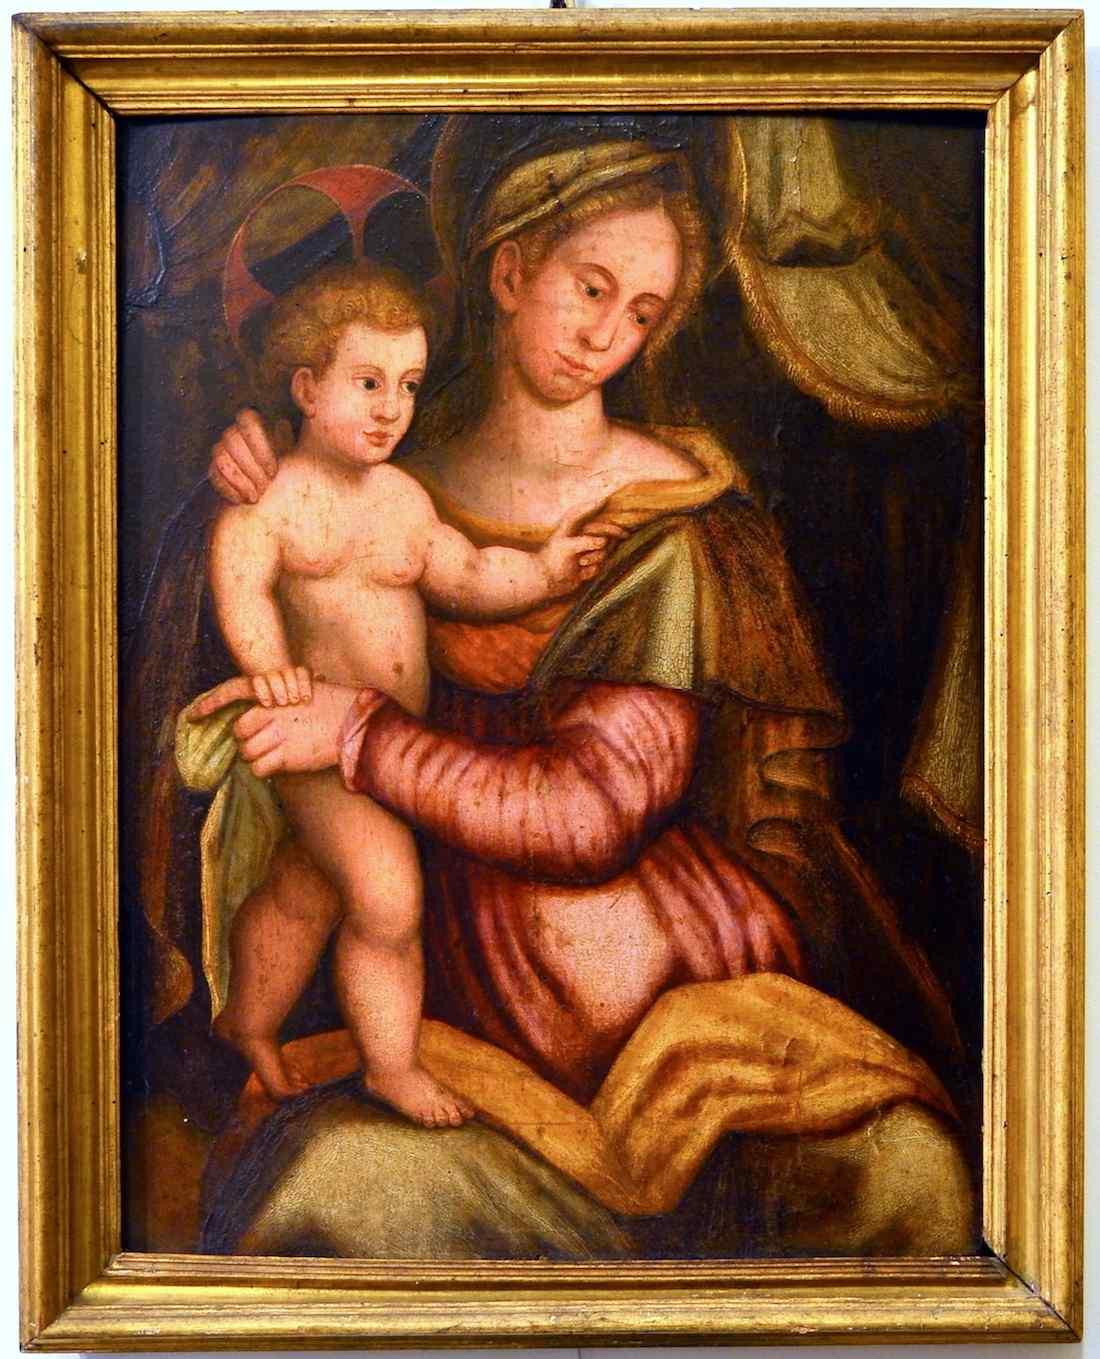 Tuscan school beginning of the sixteenth century, Madonna wi